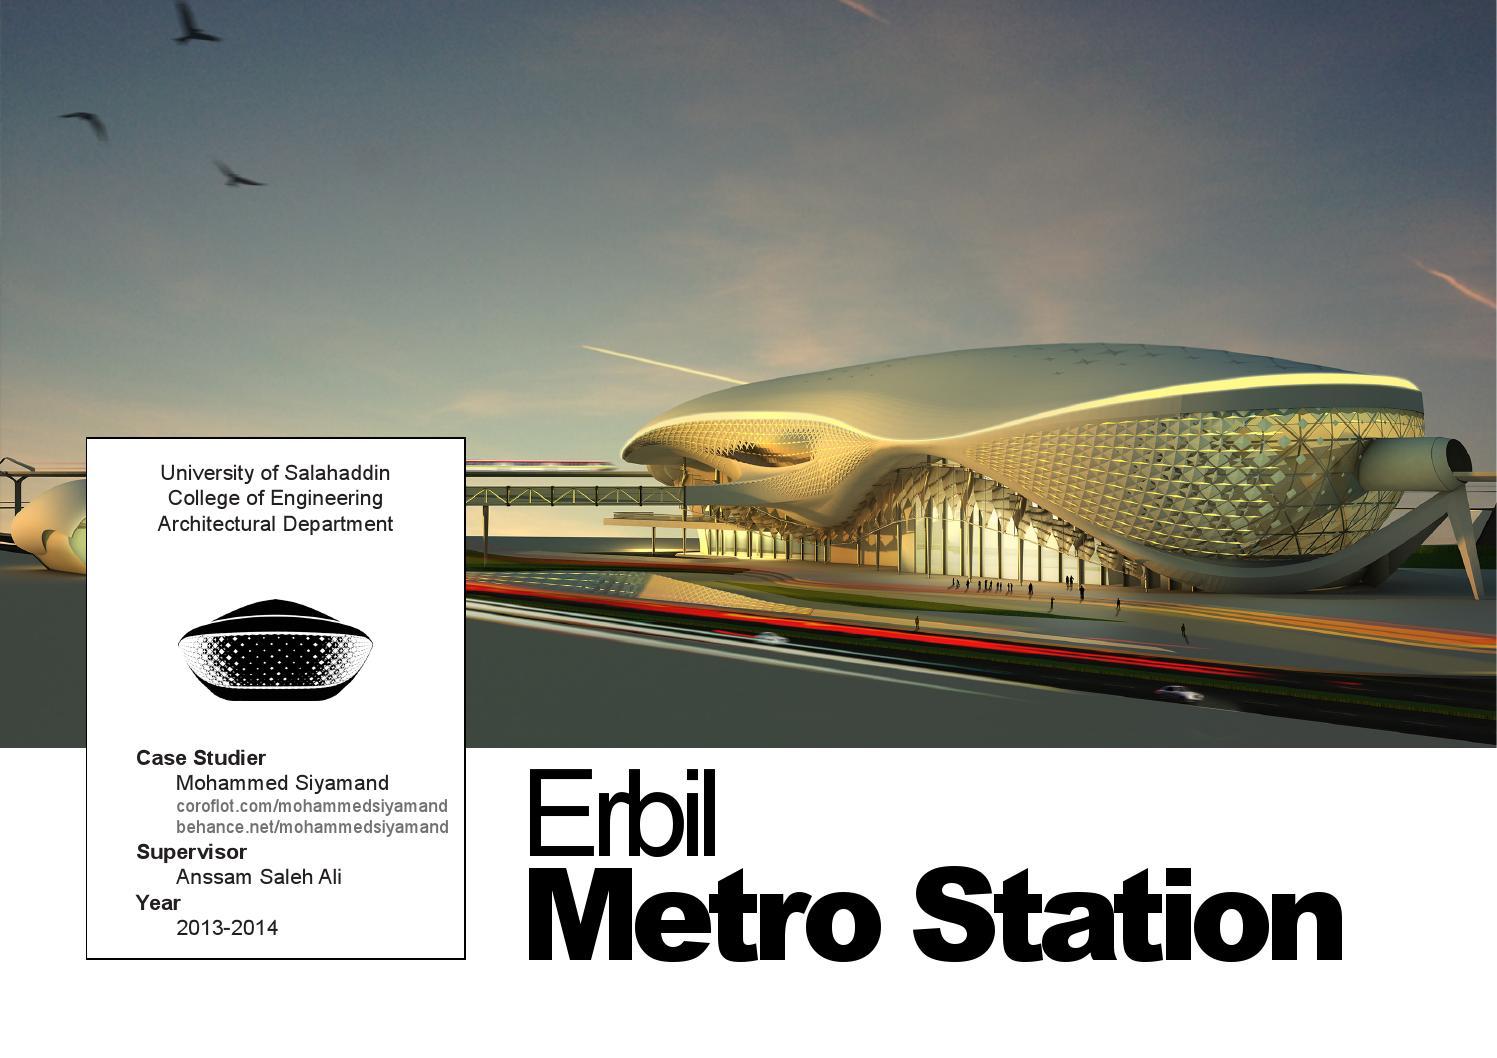 Erbil metro station by mohammed siyamand by Mohammed Siyamand - issuu